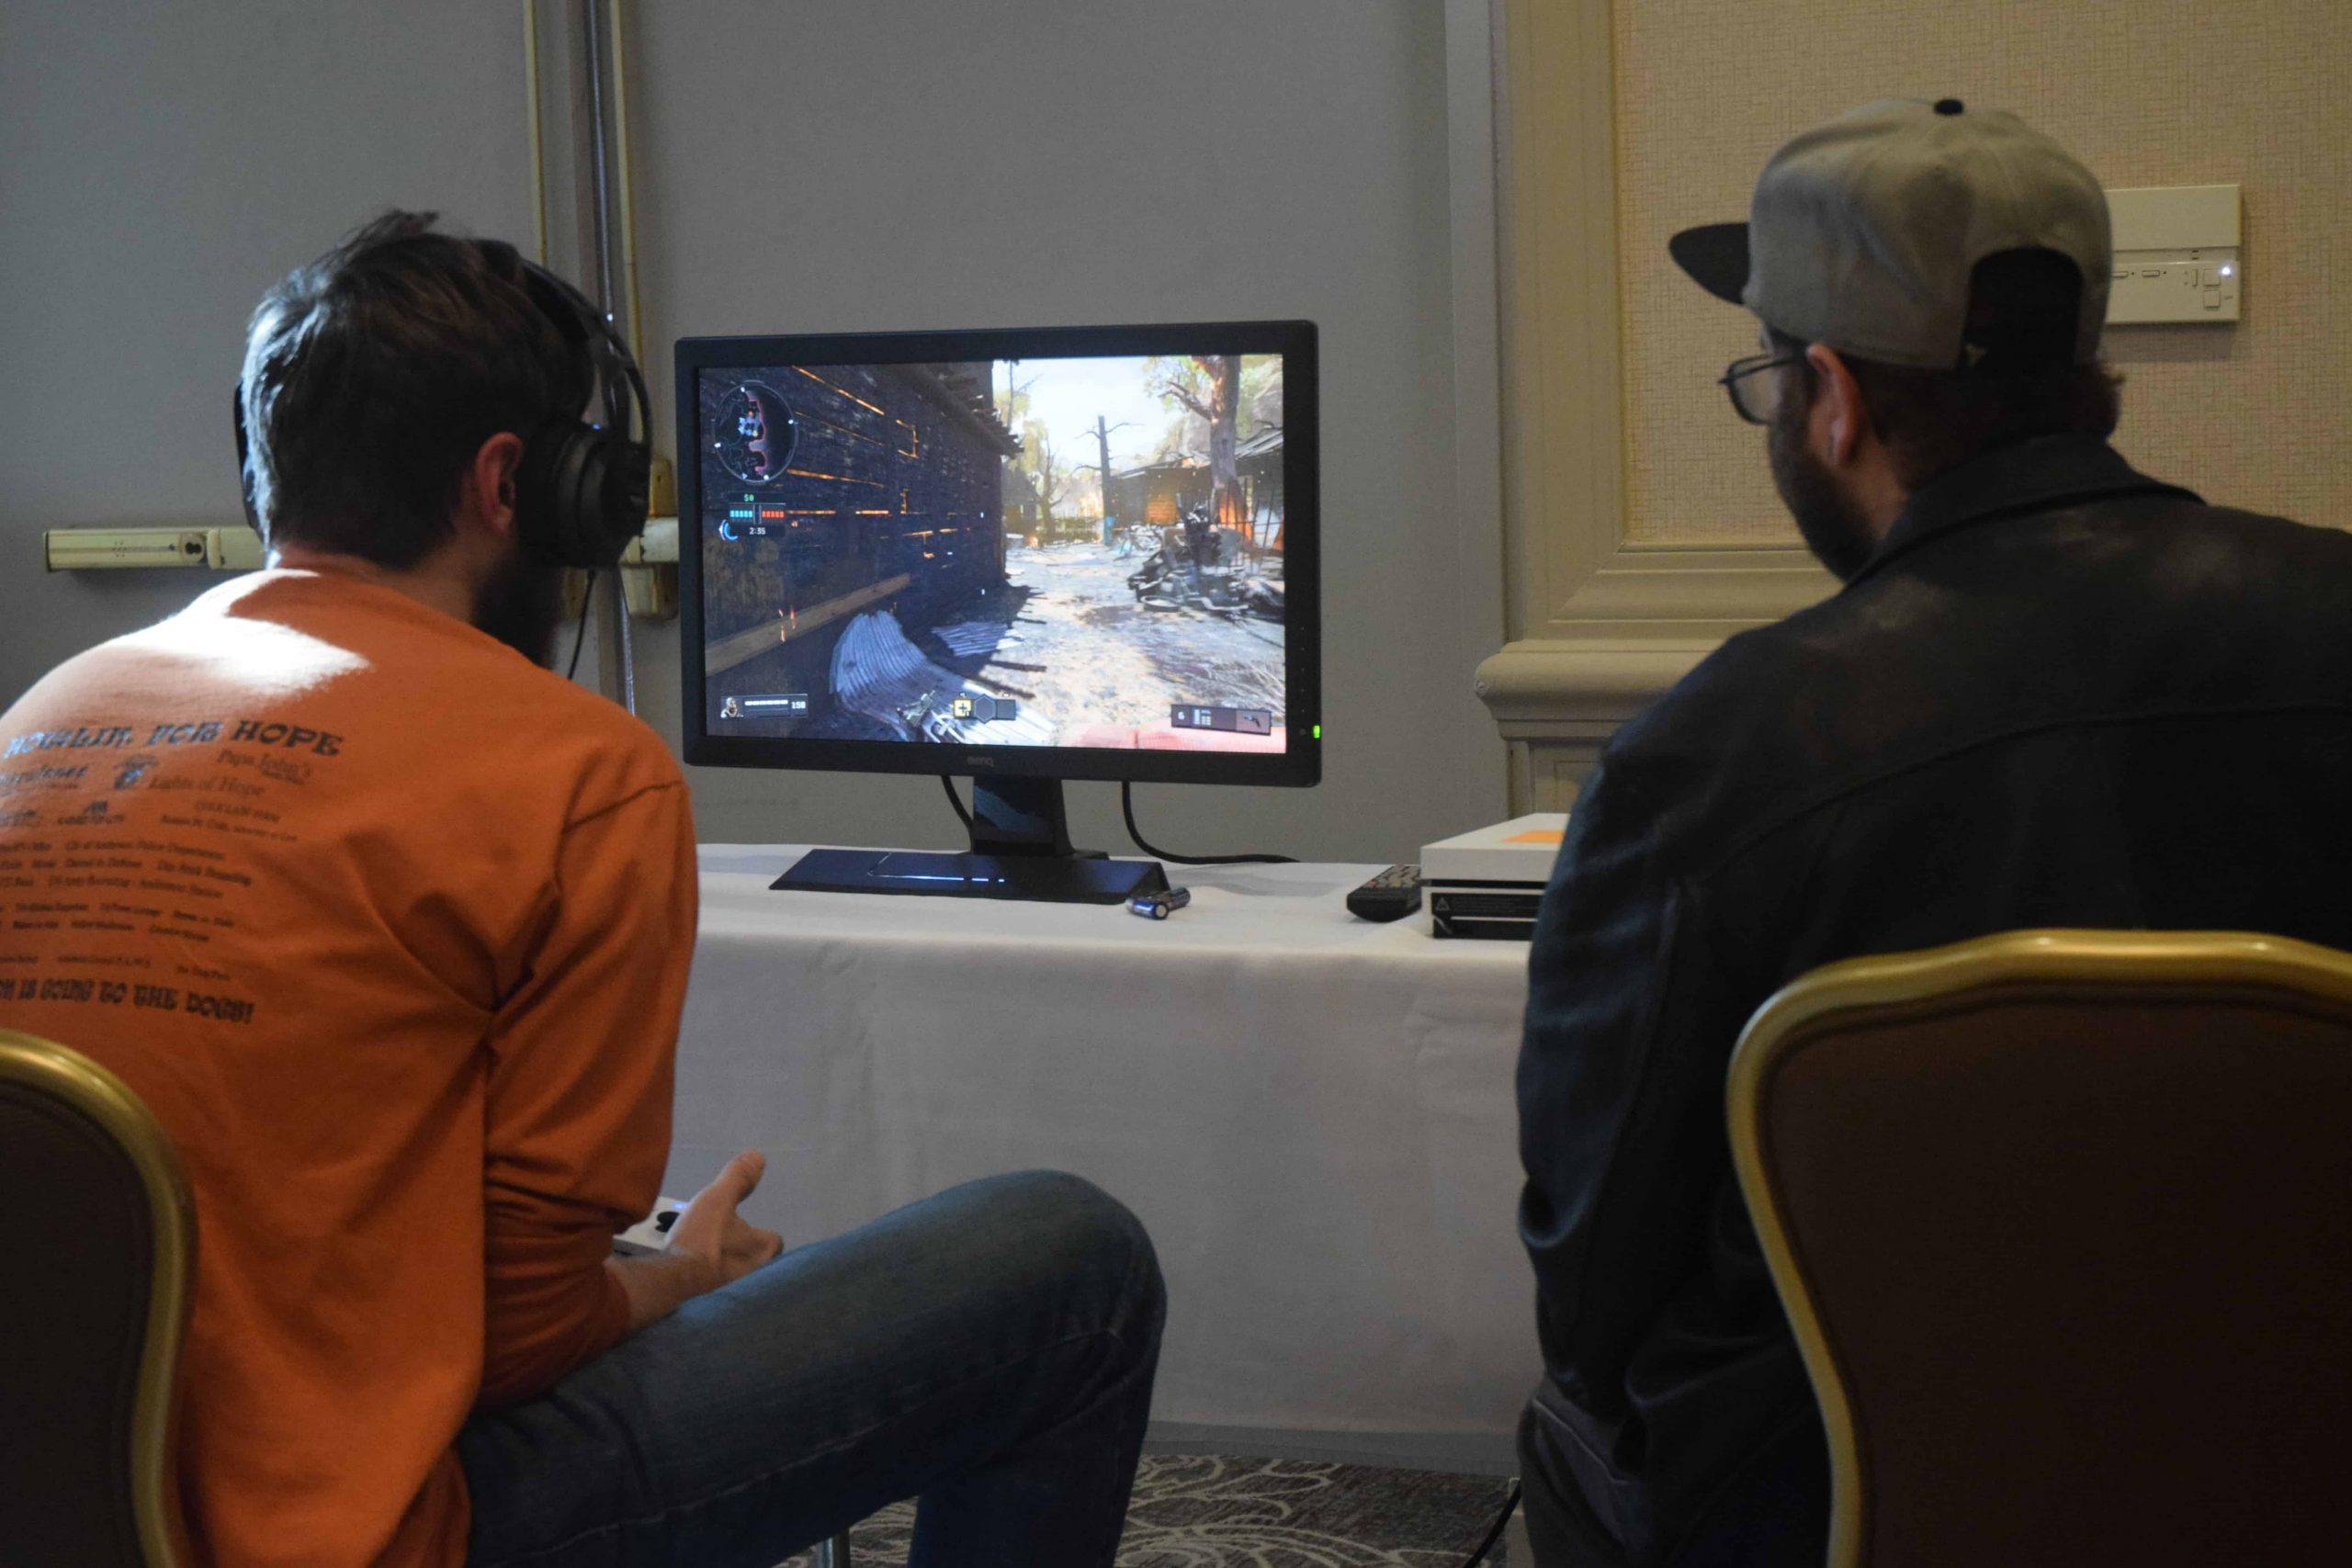 monitor-hdmi-gaming-xcyp1